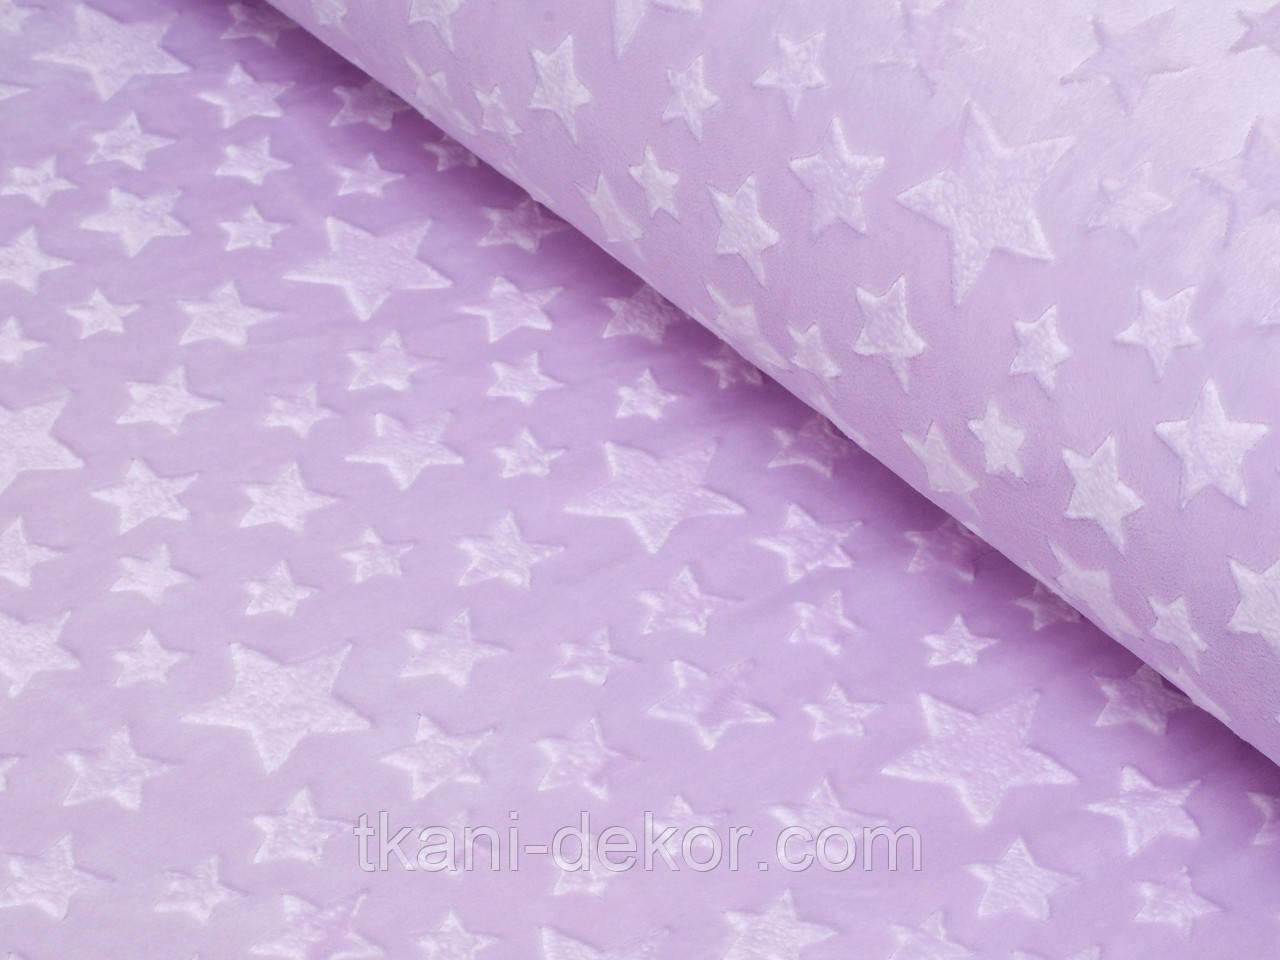 Ткань плюшевая Minky Stars лиловые звезды